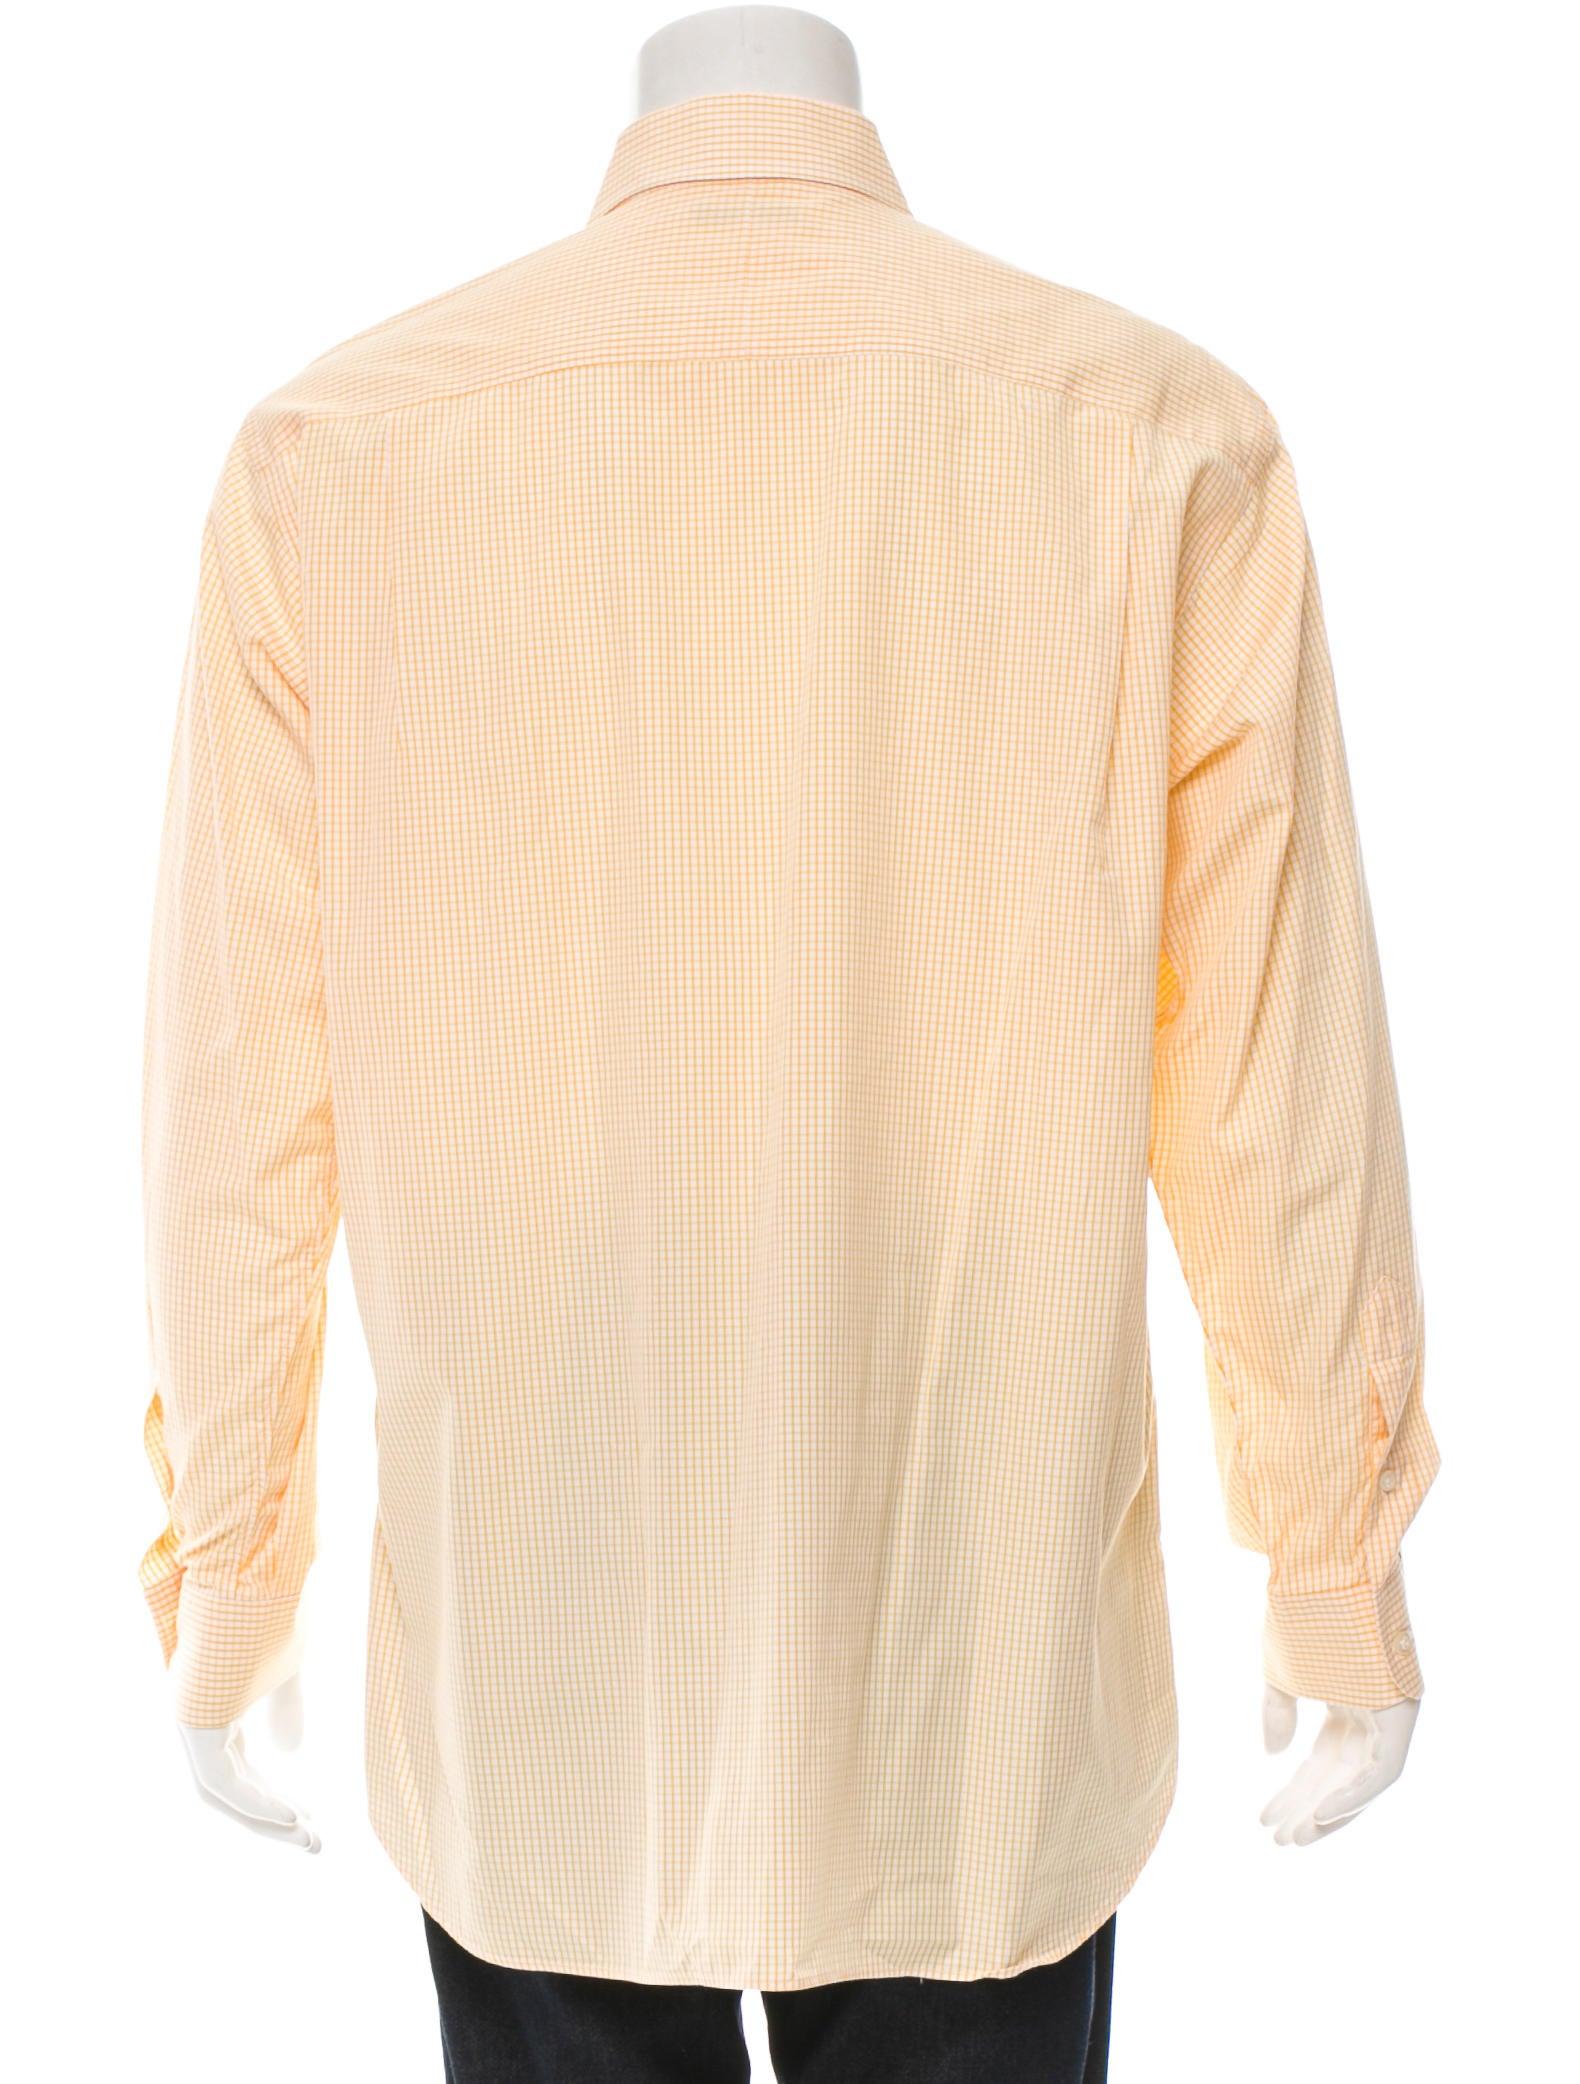 Burberry Long Sleeve Button Up Shirt Clothing Bur53146